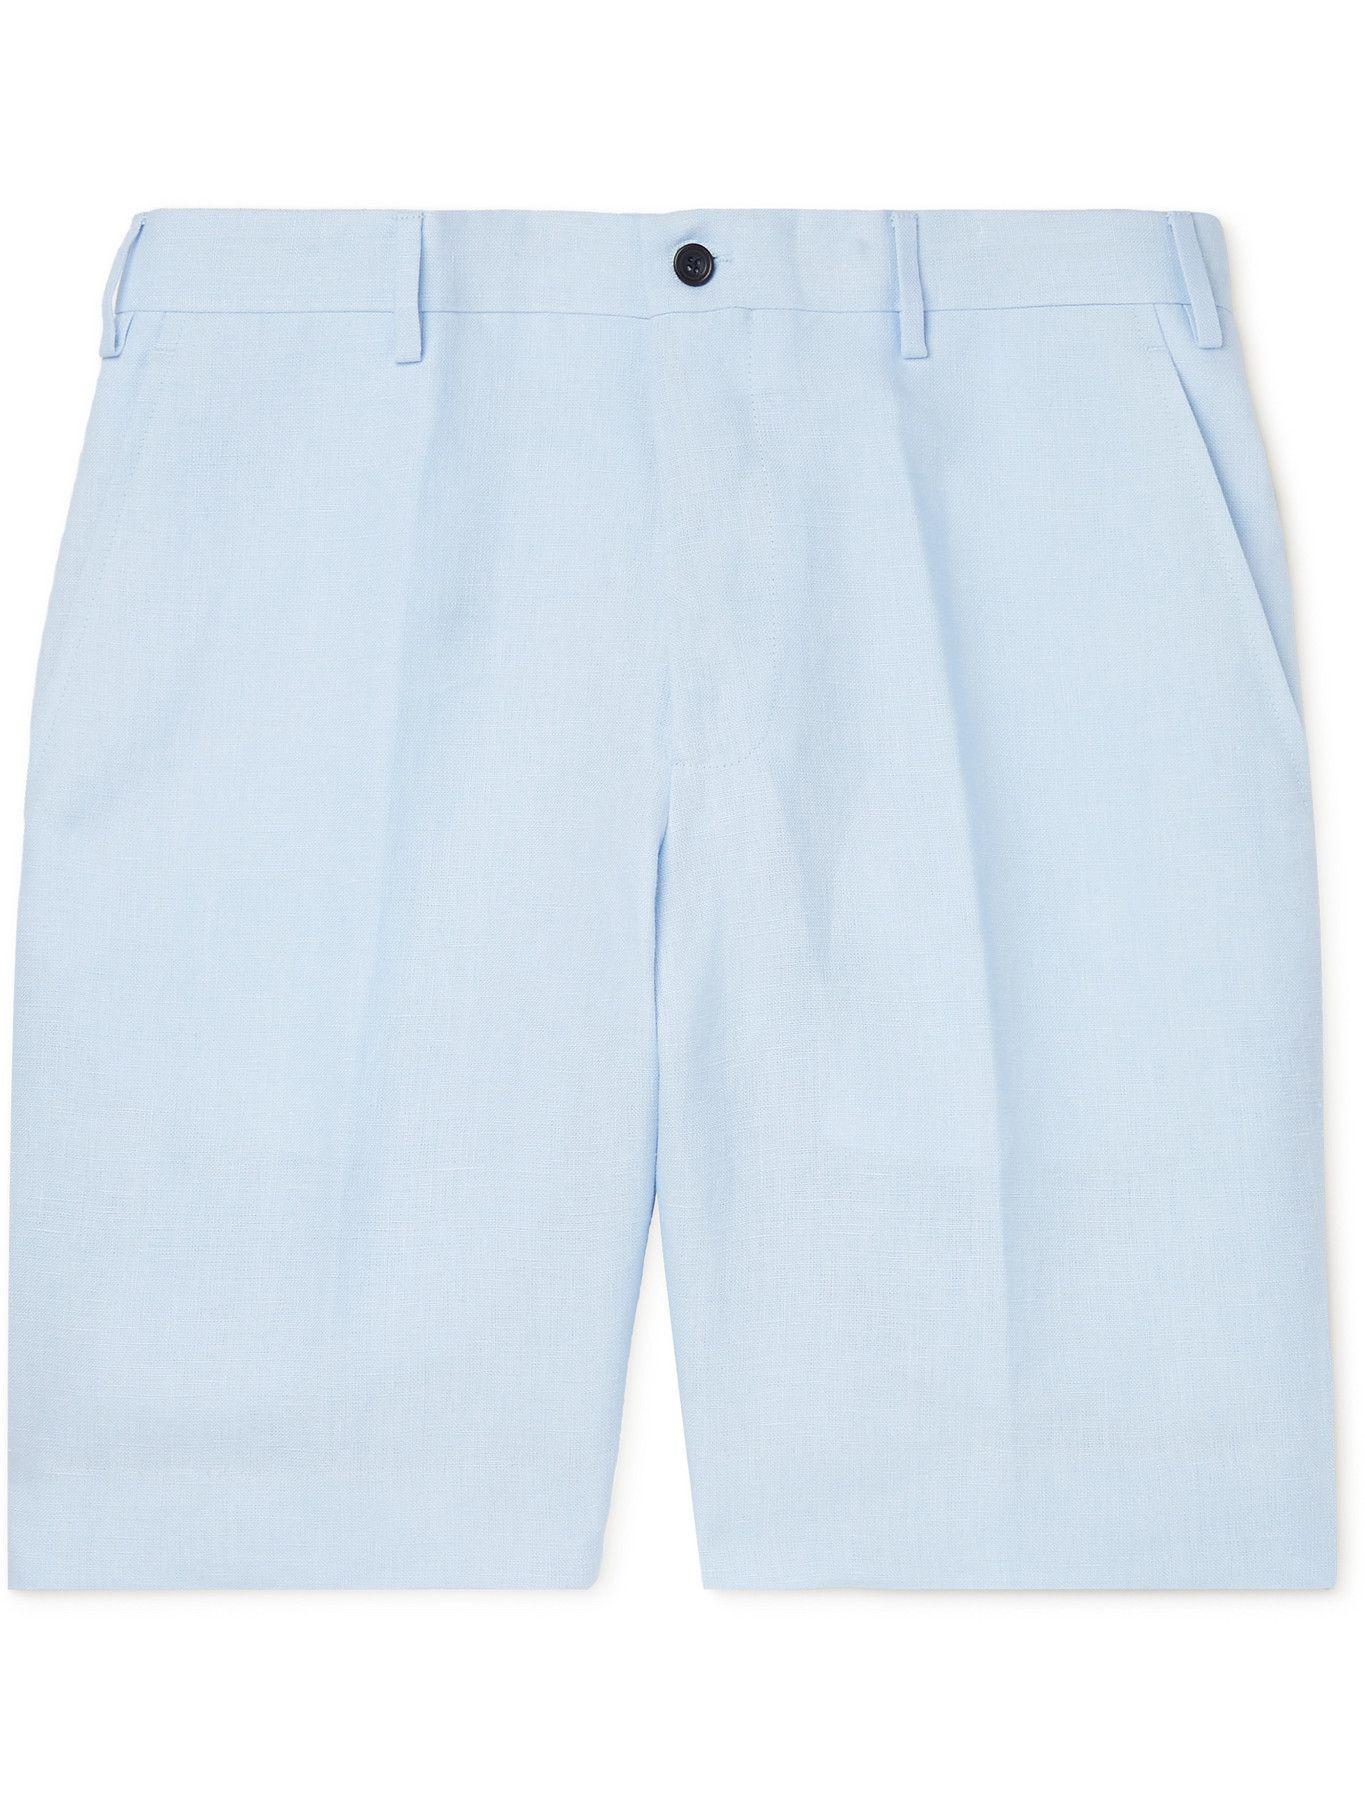 Photo: ANDERSON & SHEPPARD - Wide-Leg Linen Bermuda Shorts - Blue